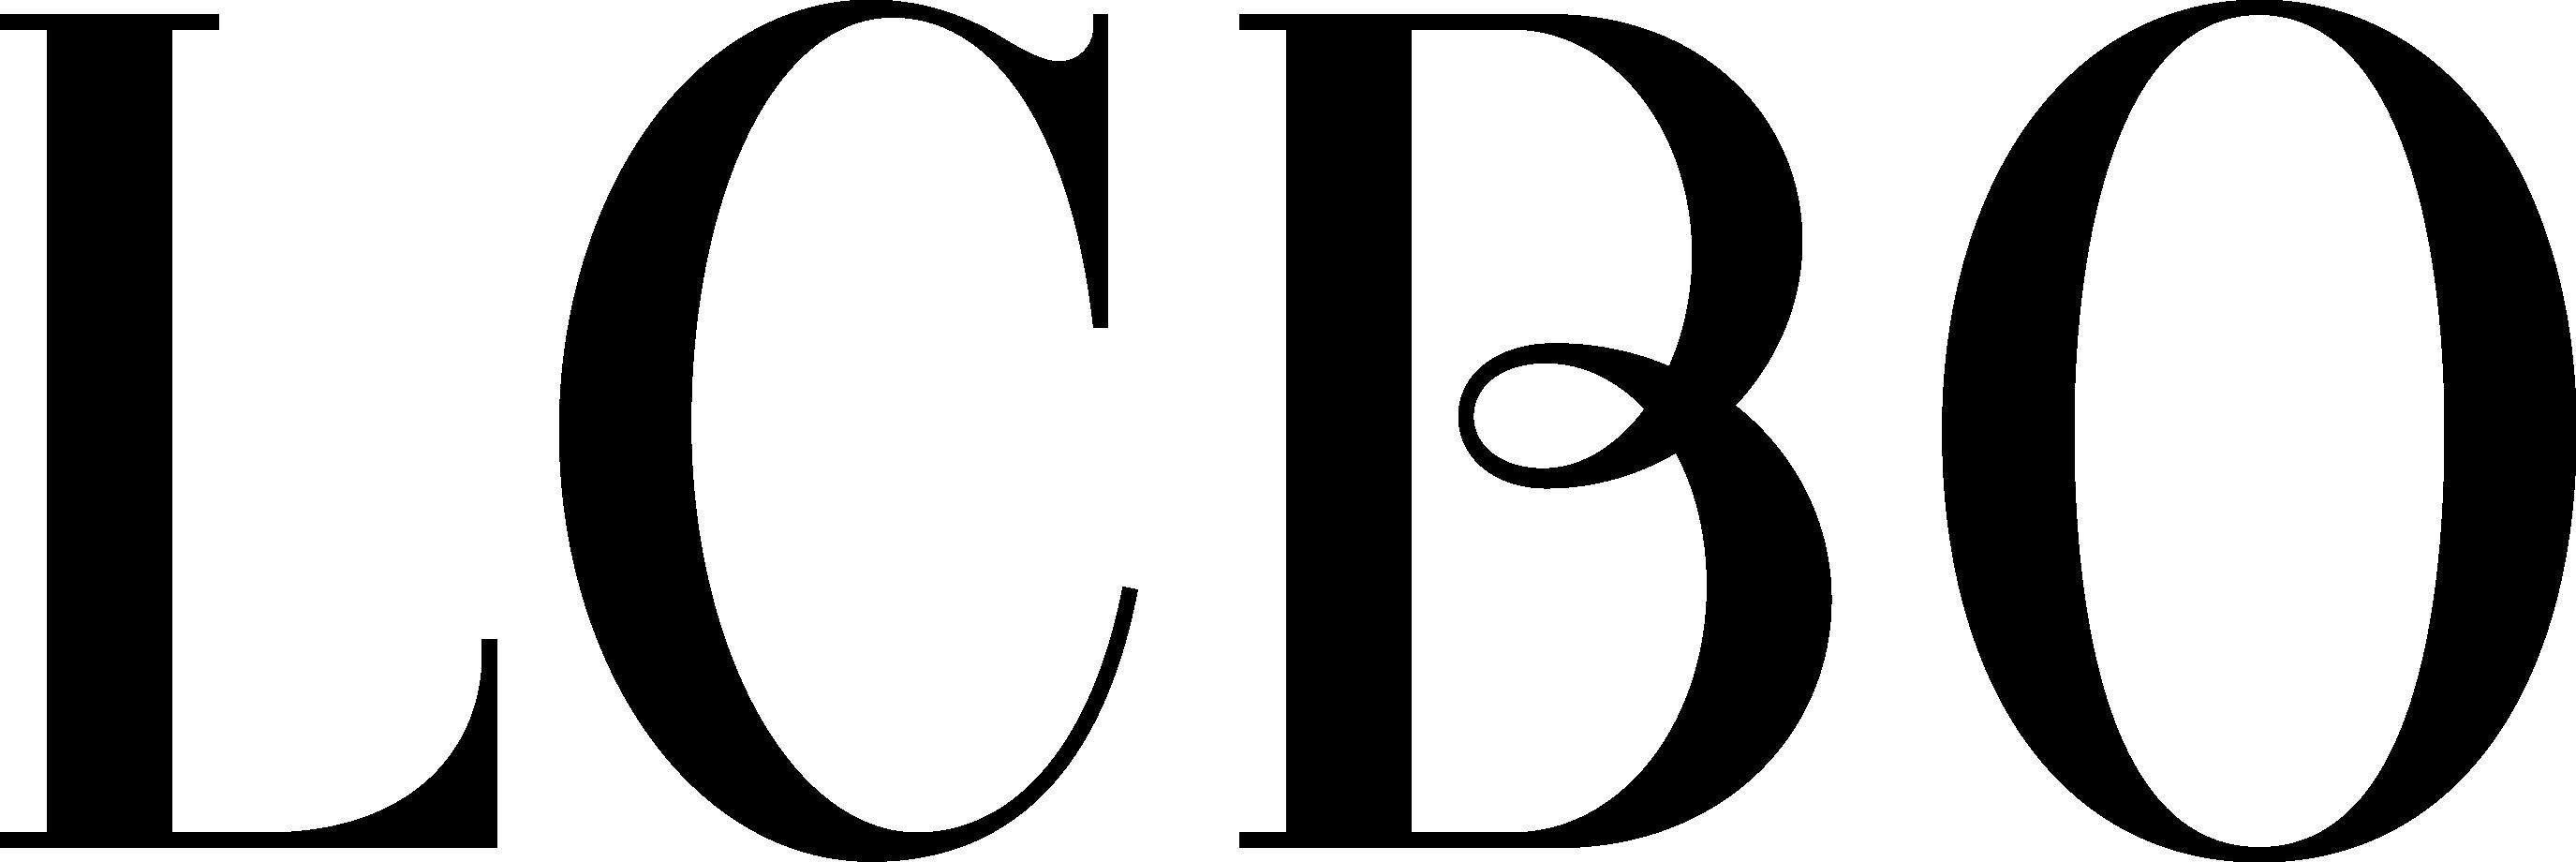 Logo for LCBO.